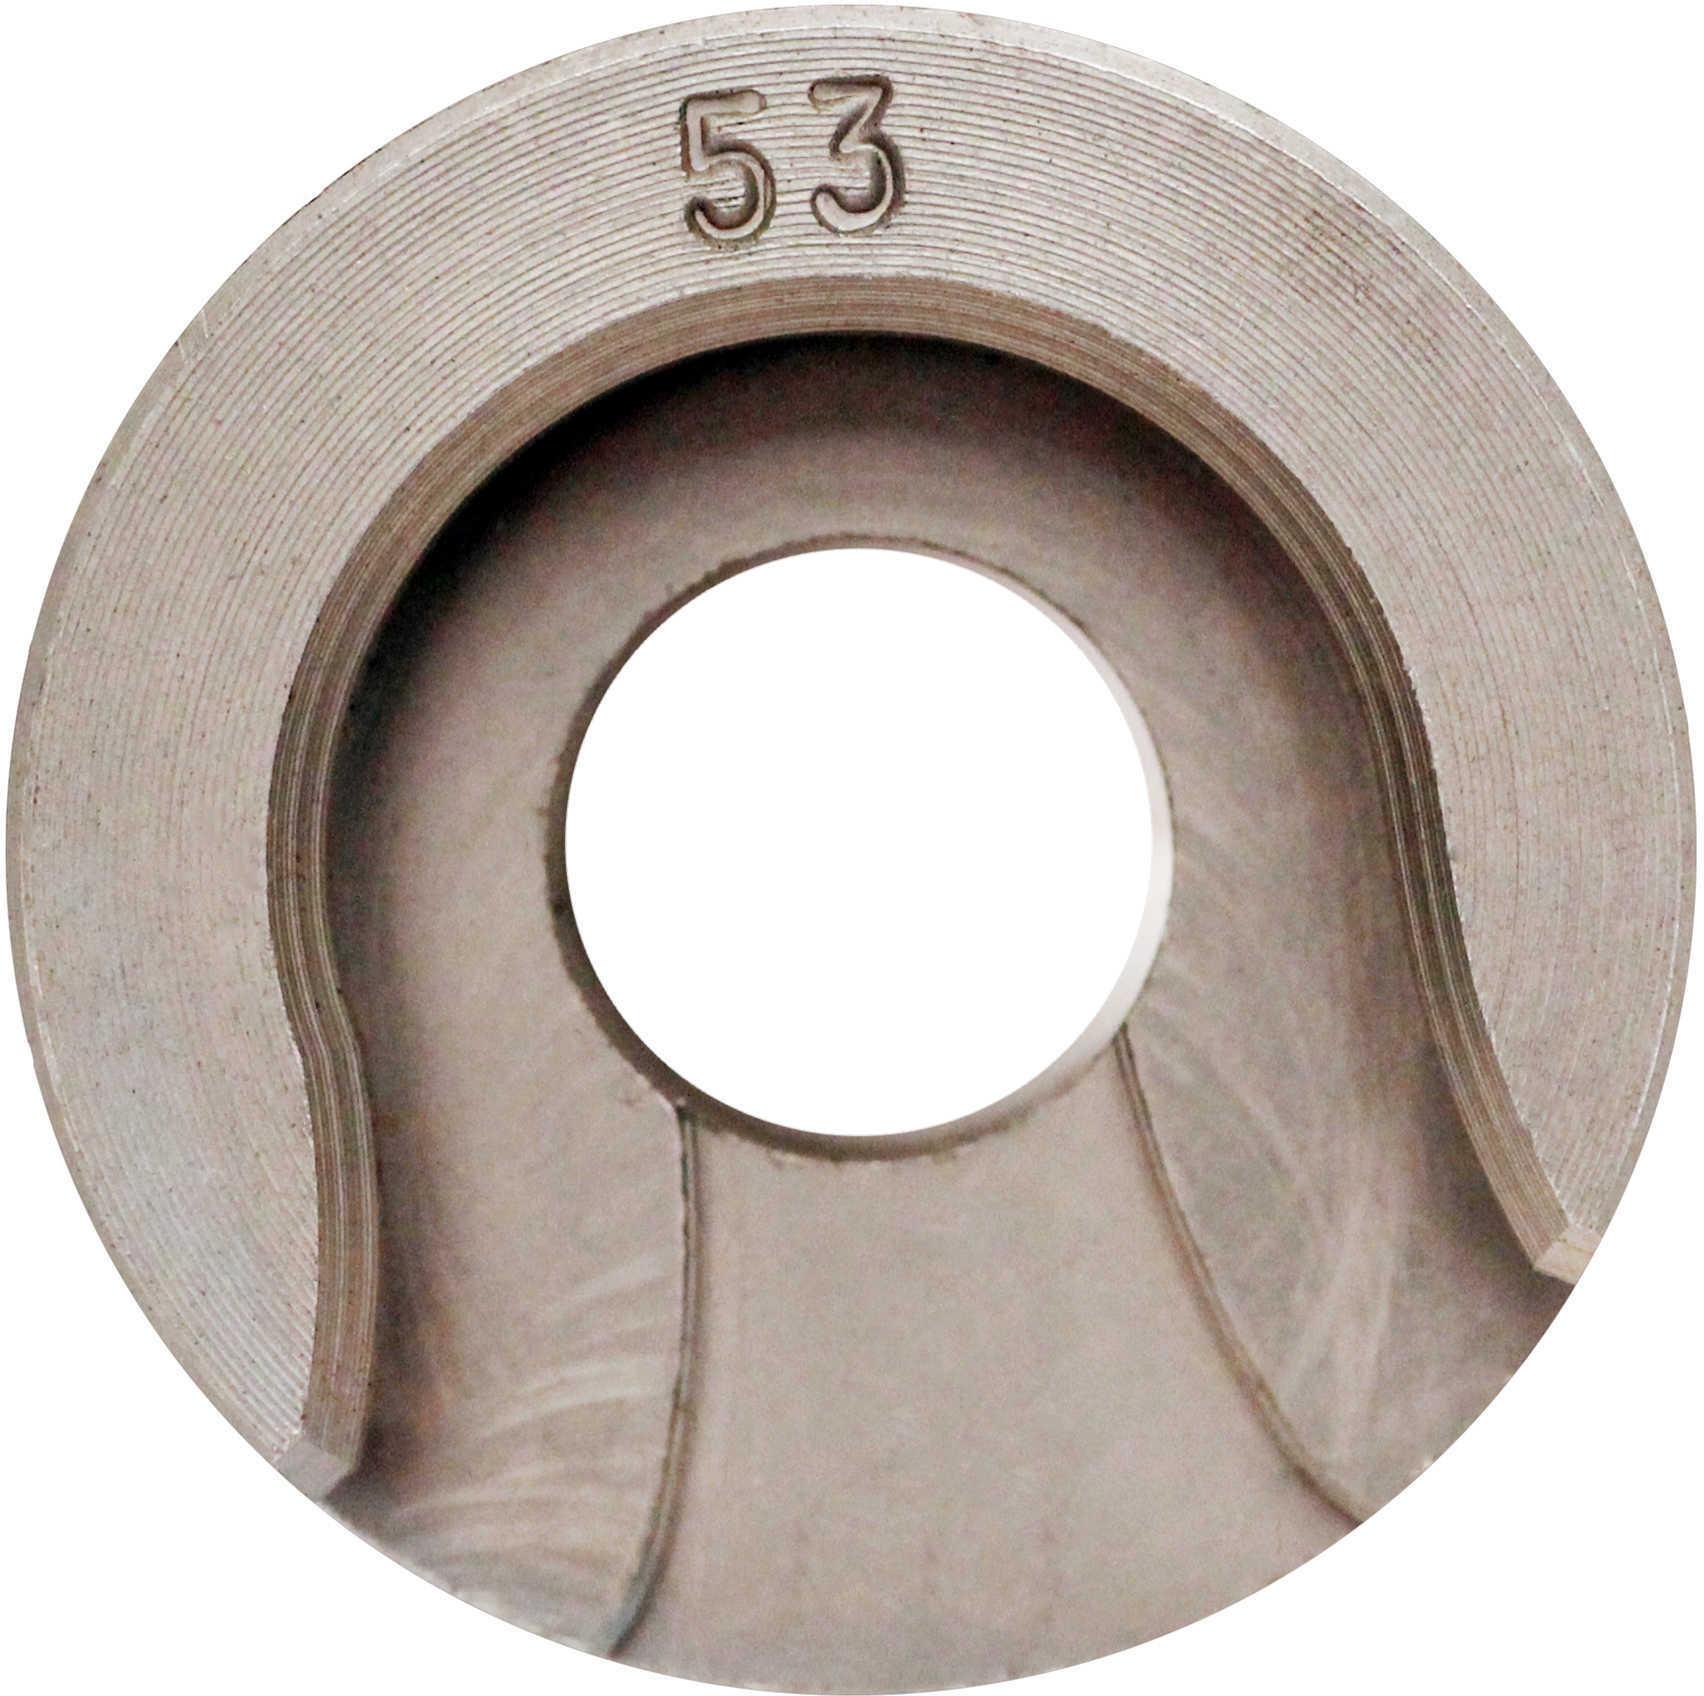 Hornady Shell Holder Size 32 Md: 390572